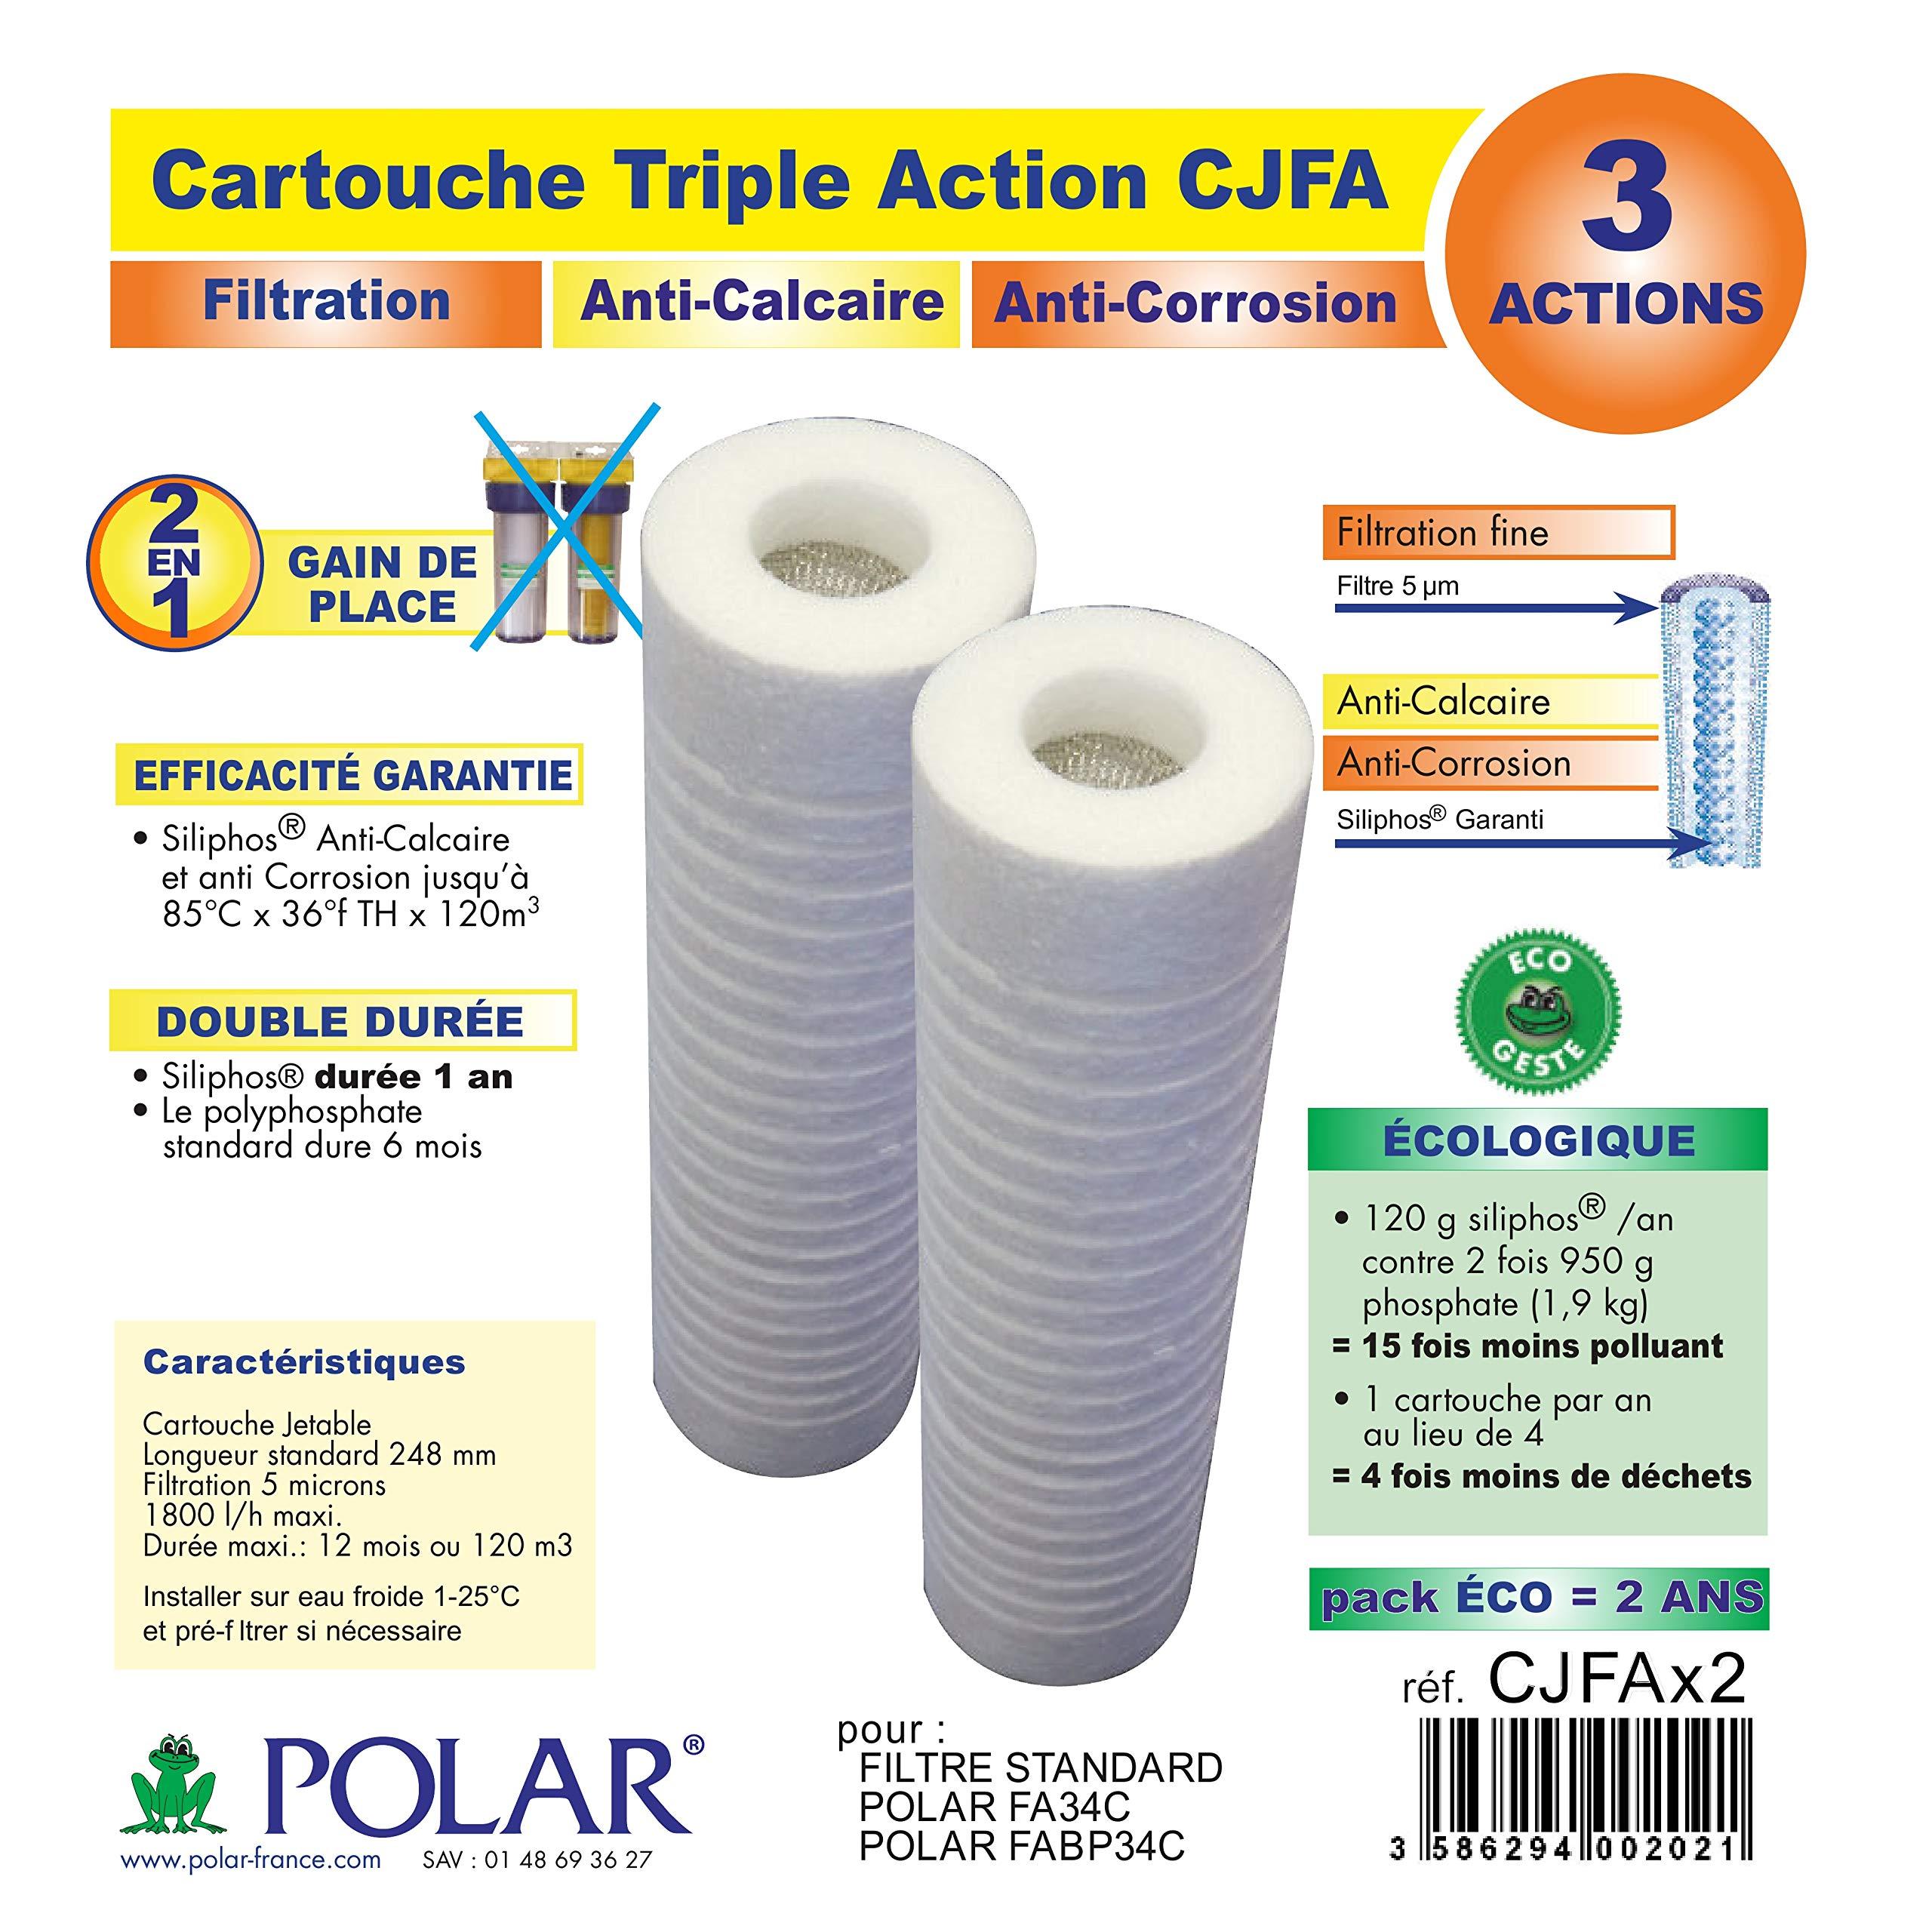 Polar – Cartouche antitartre/Corrosion pour filtre FA34C, Pack de 2 – CJFAX2